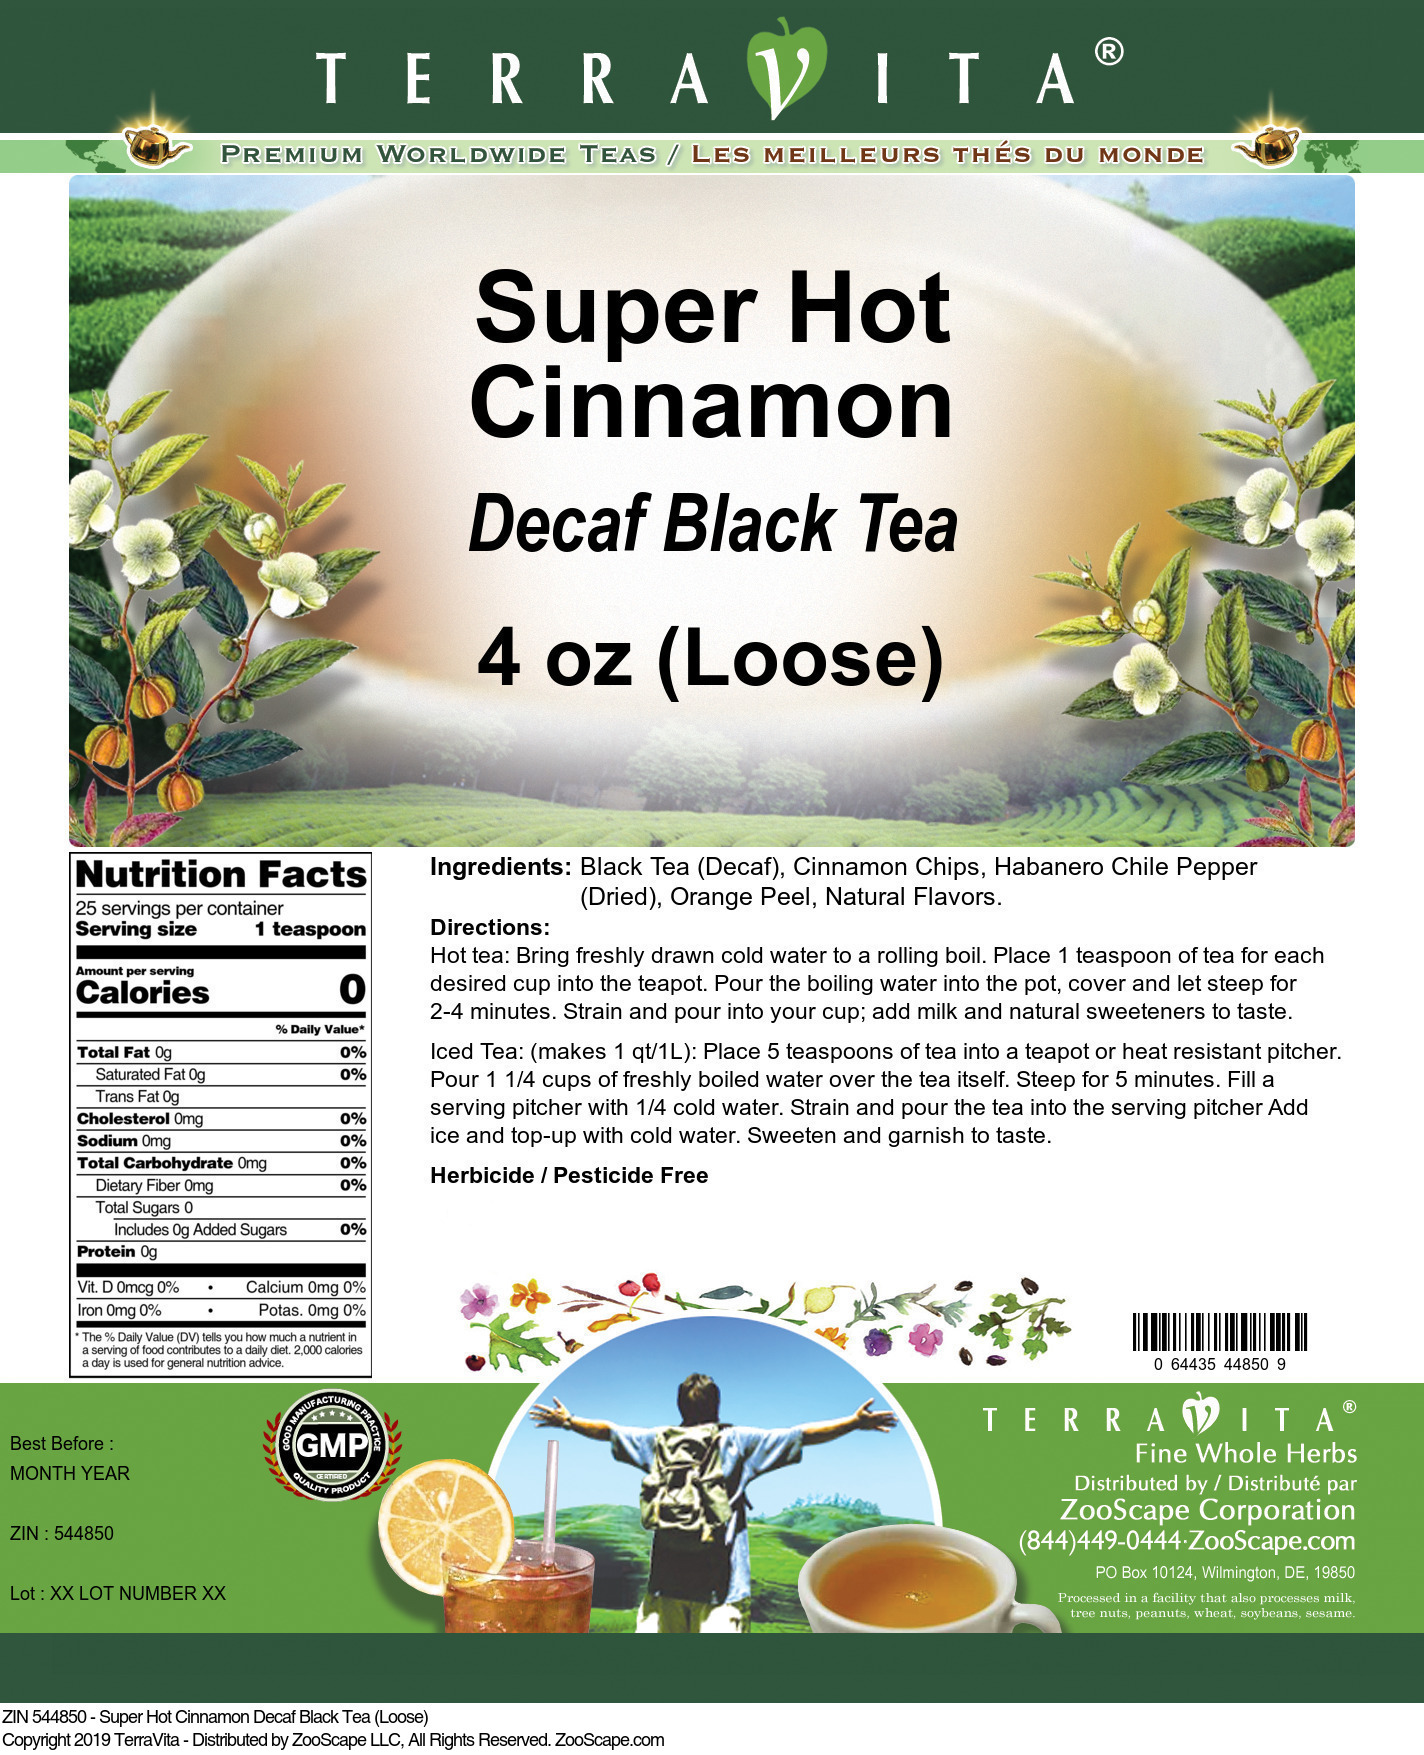 Super Hot Cinnamon Decaf Black Tea